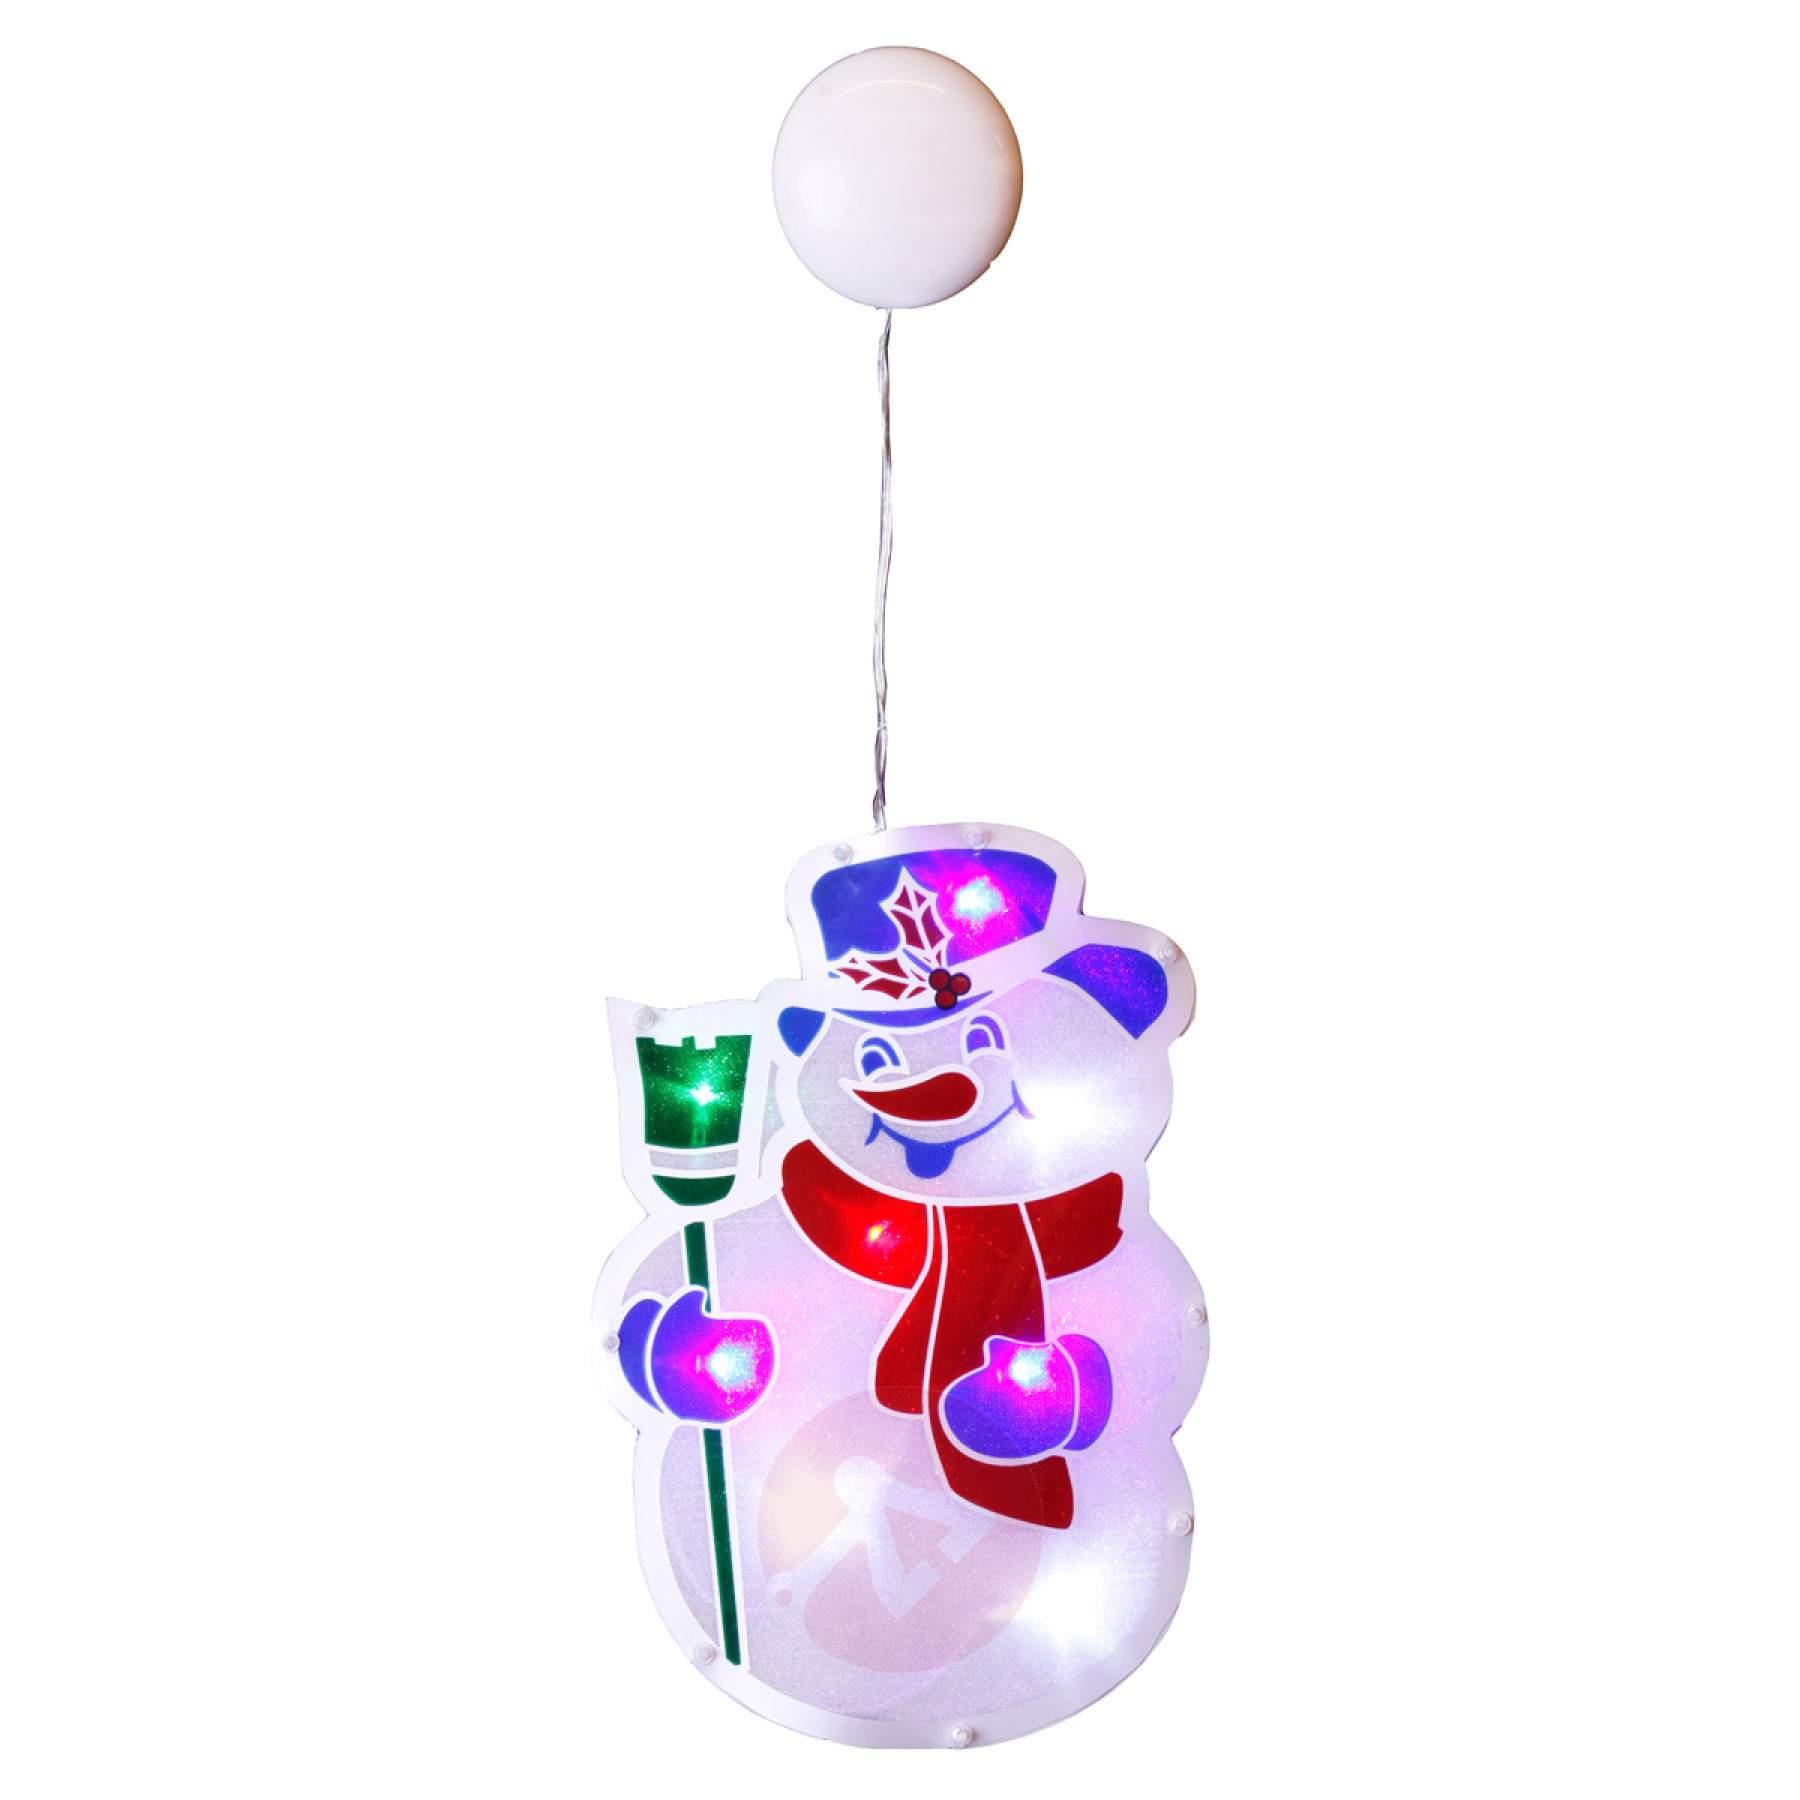 1800x1800 Window Silhouette Snowman With Led Illumination Lights.ie